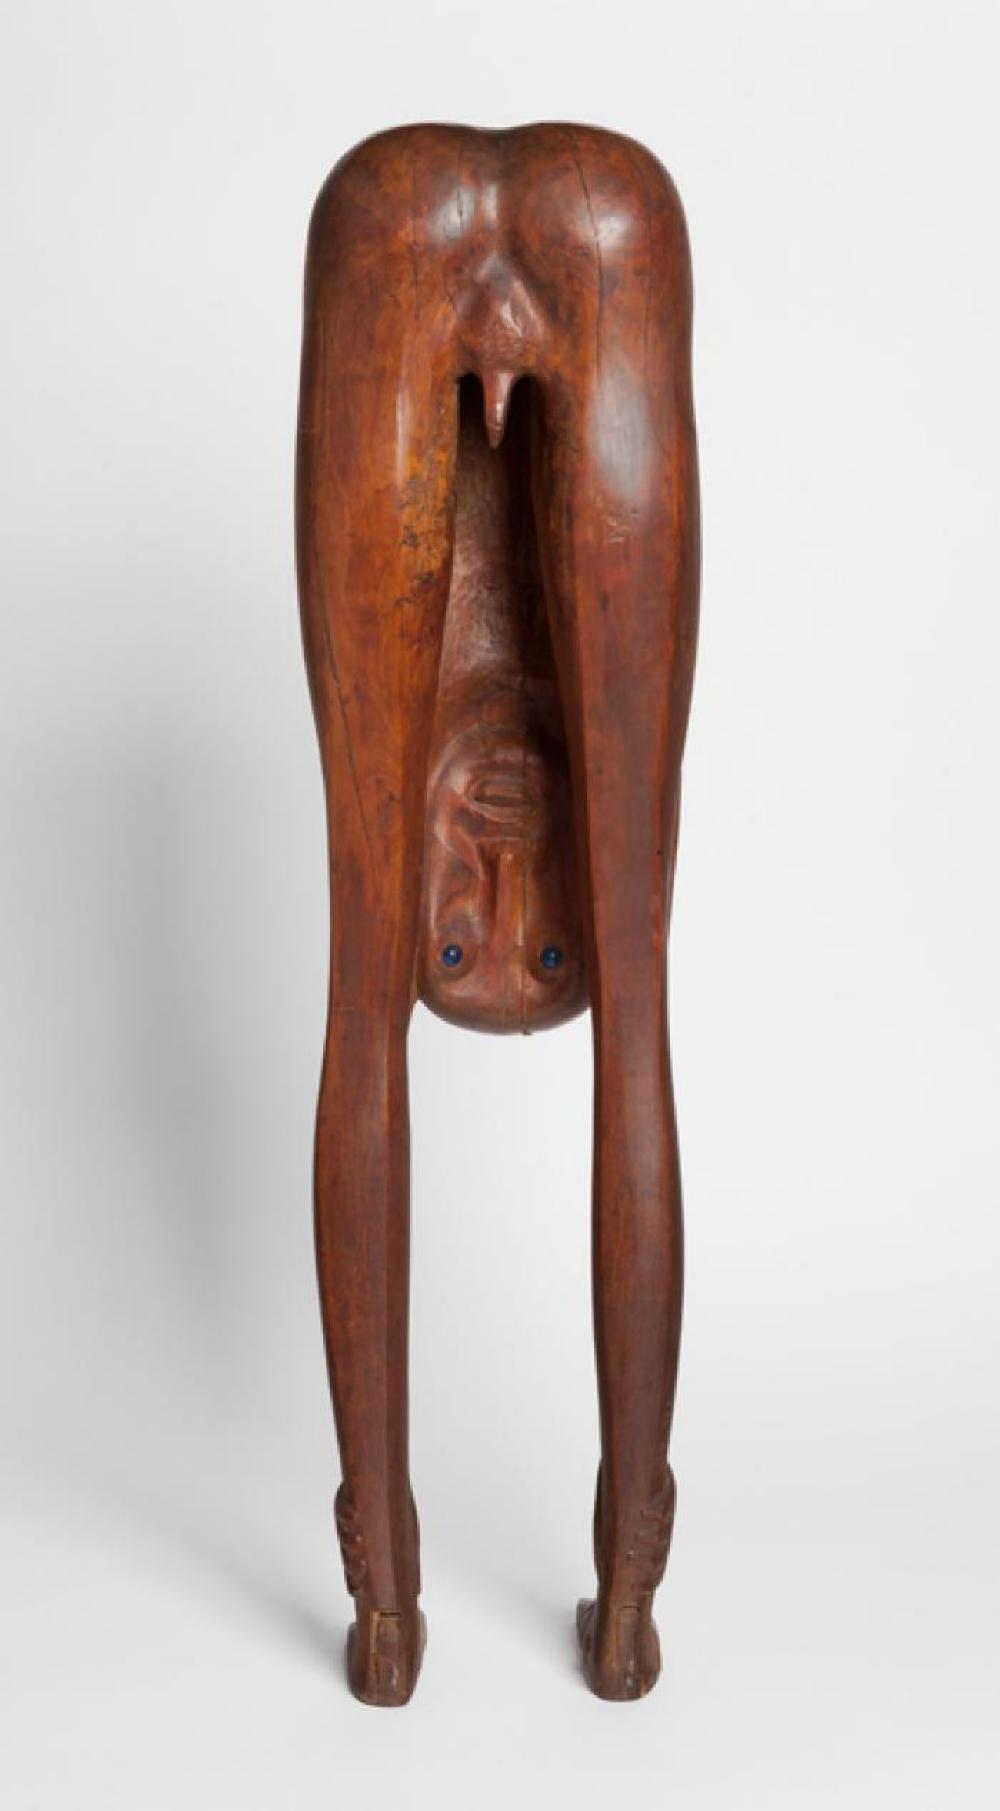 Boy Looking through Legs, image 1